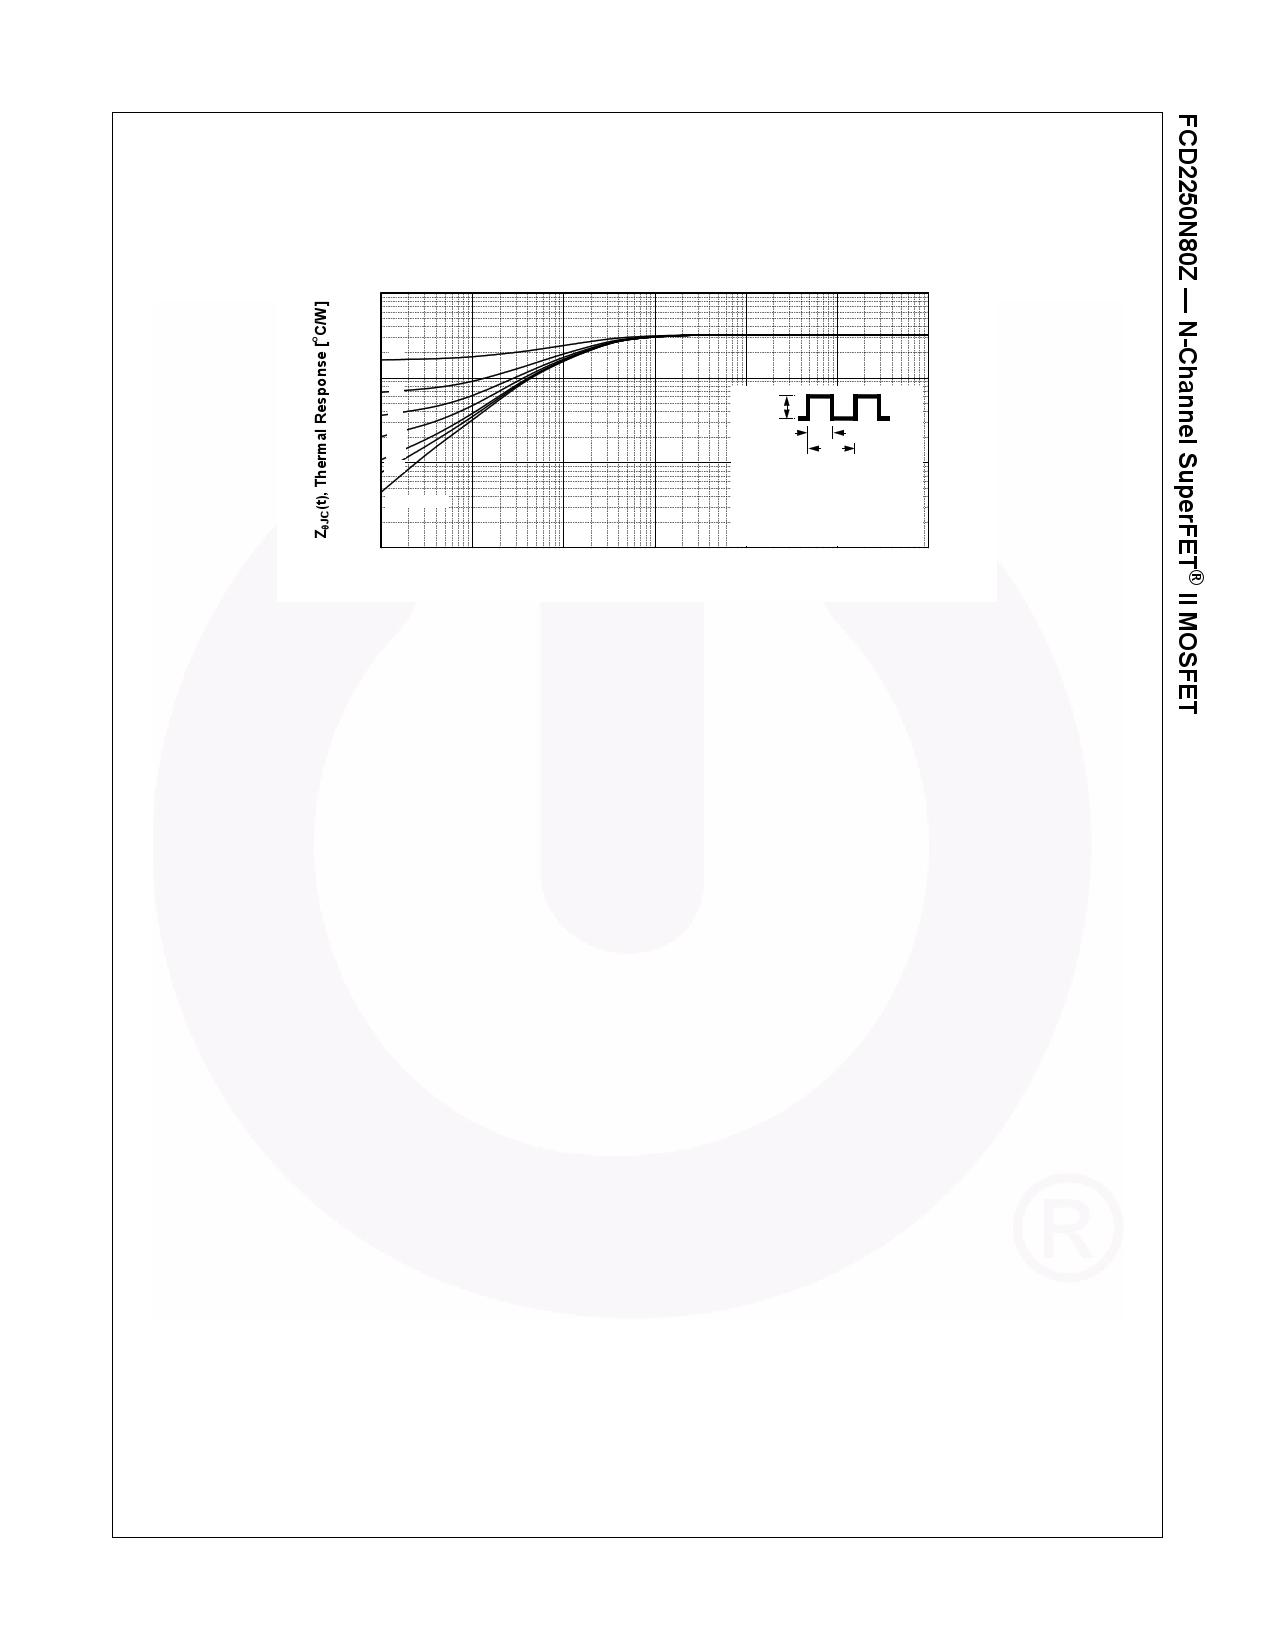 FCD2250N80Z pdf